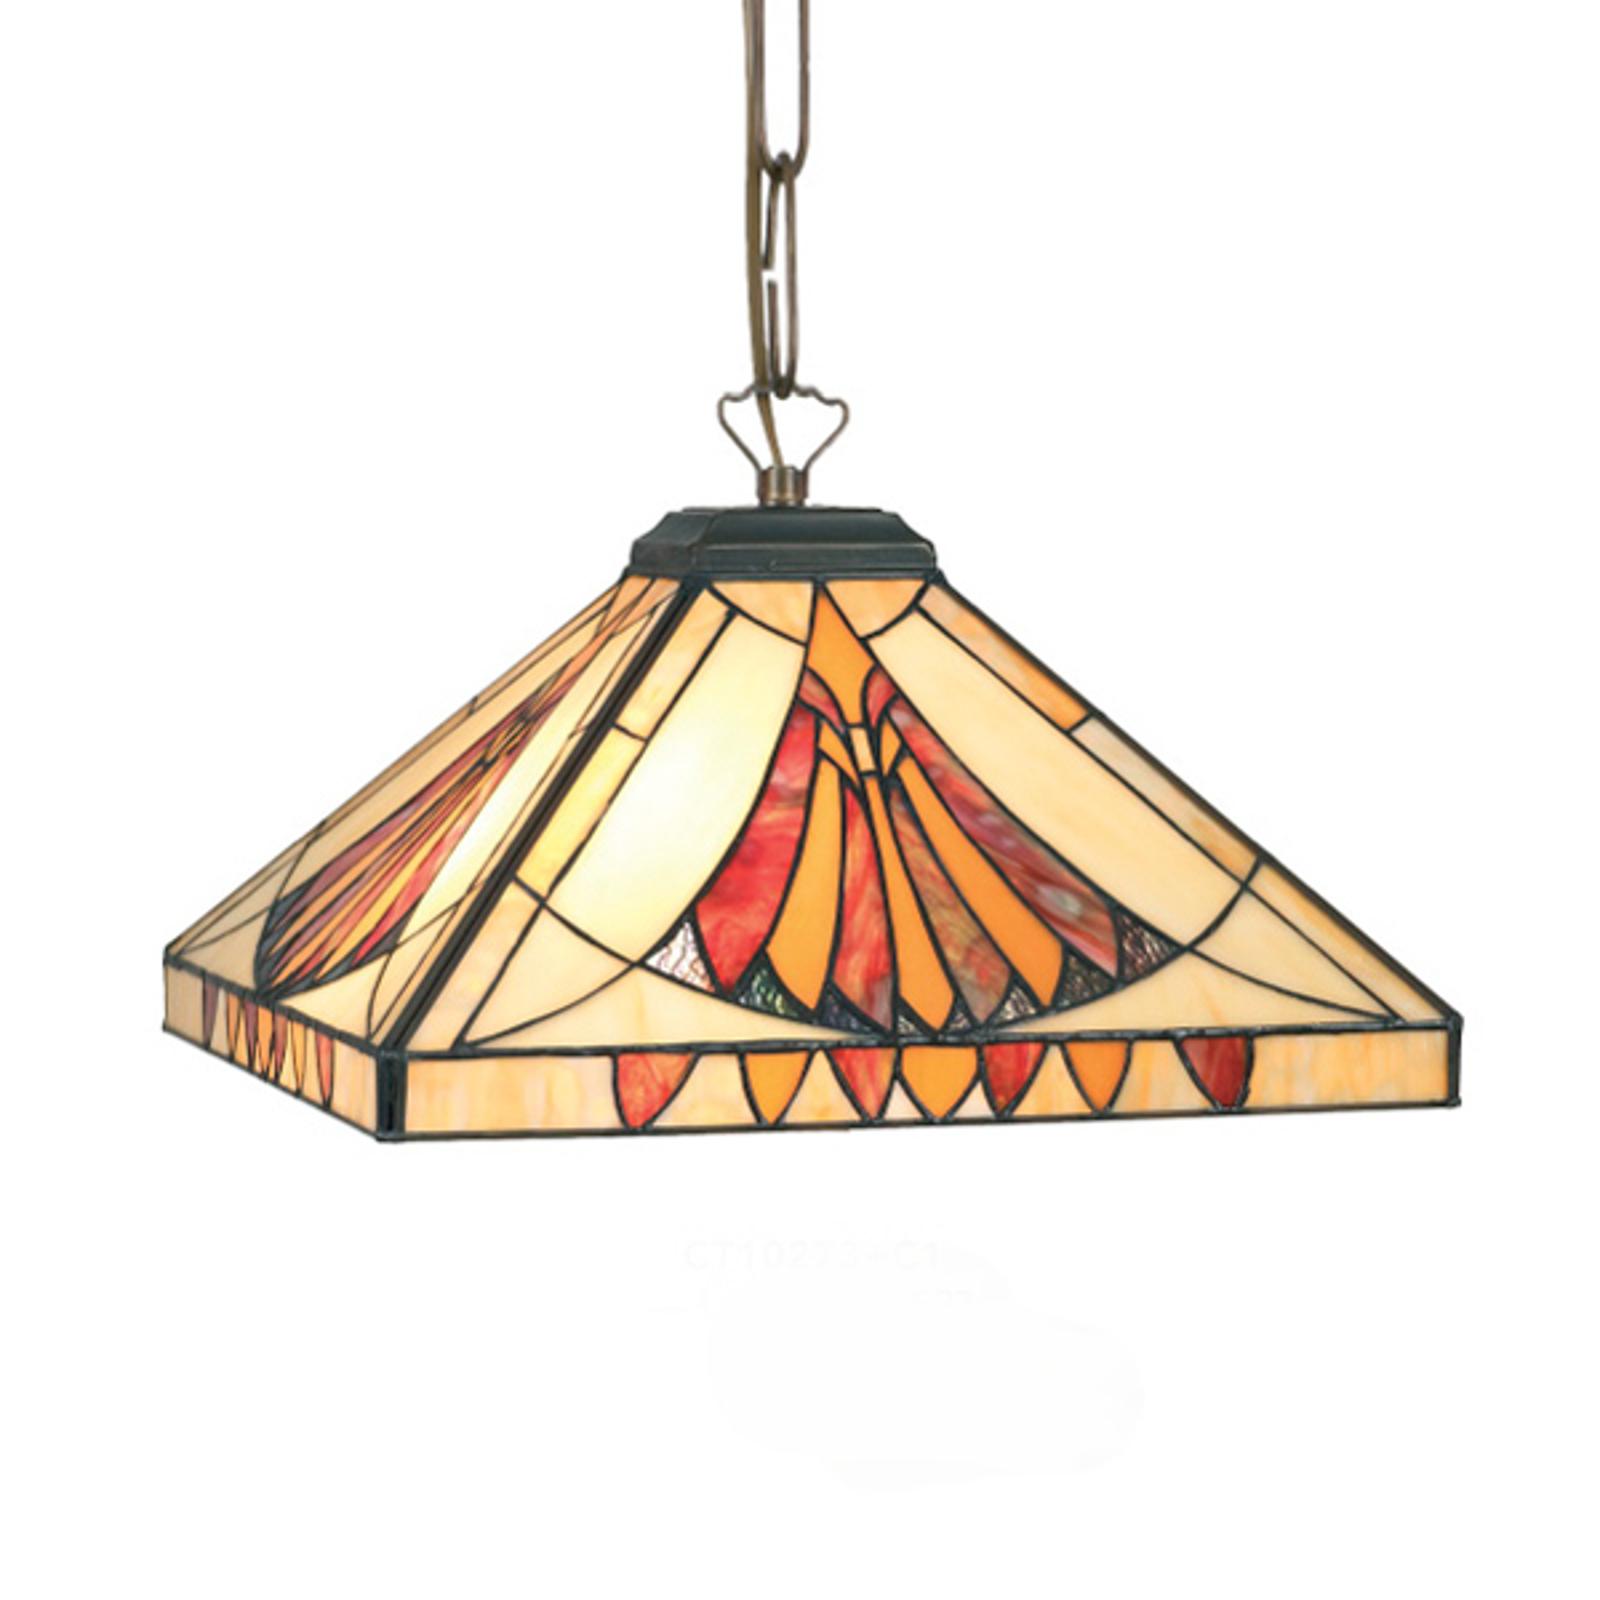 Vierkante hanglamp AMALIA